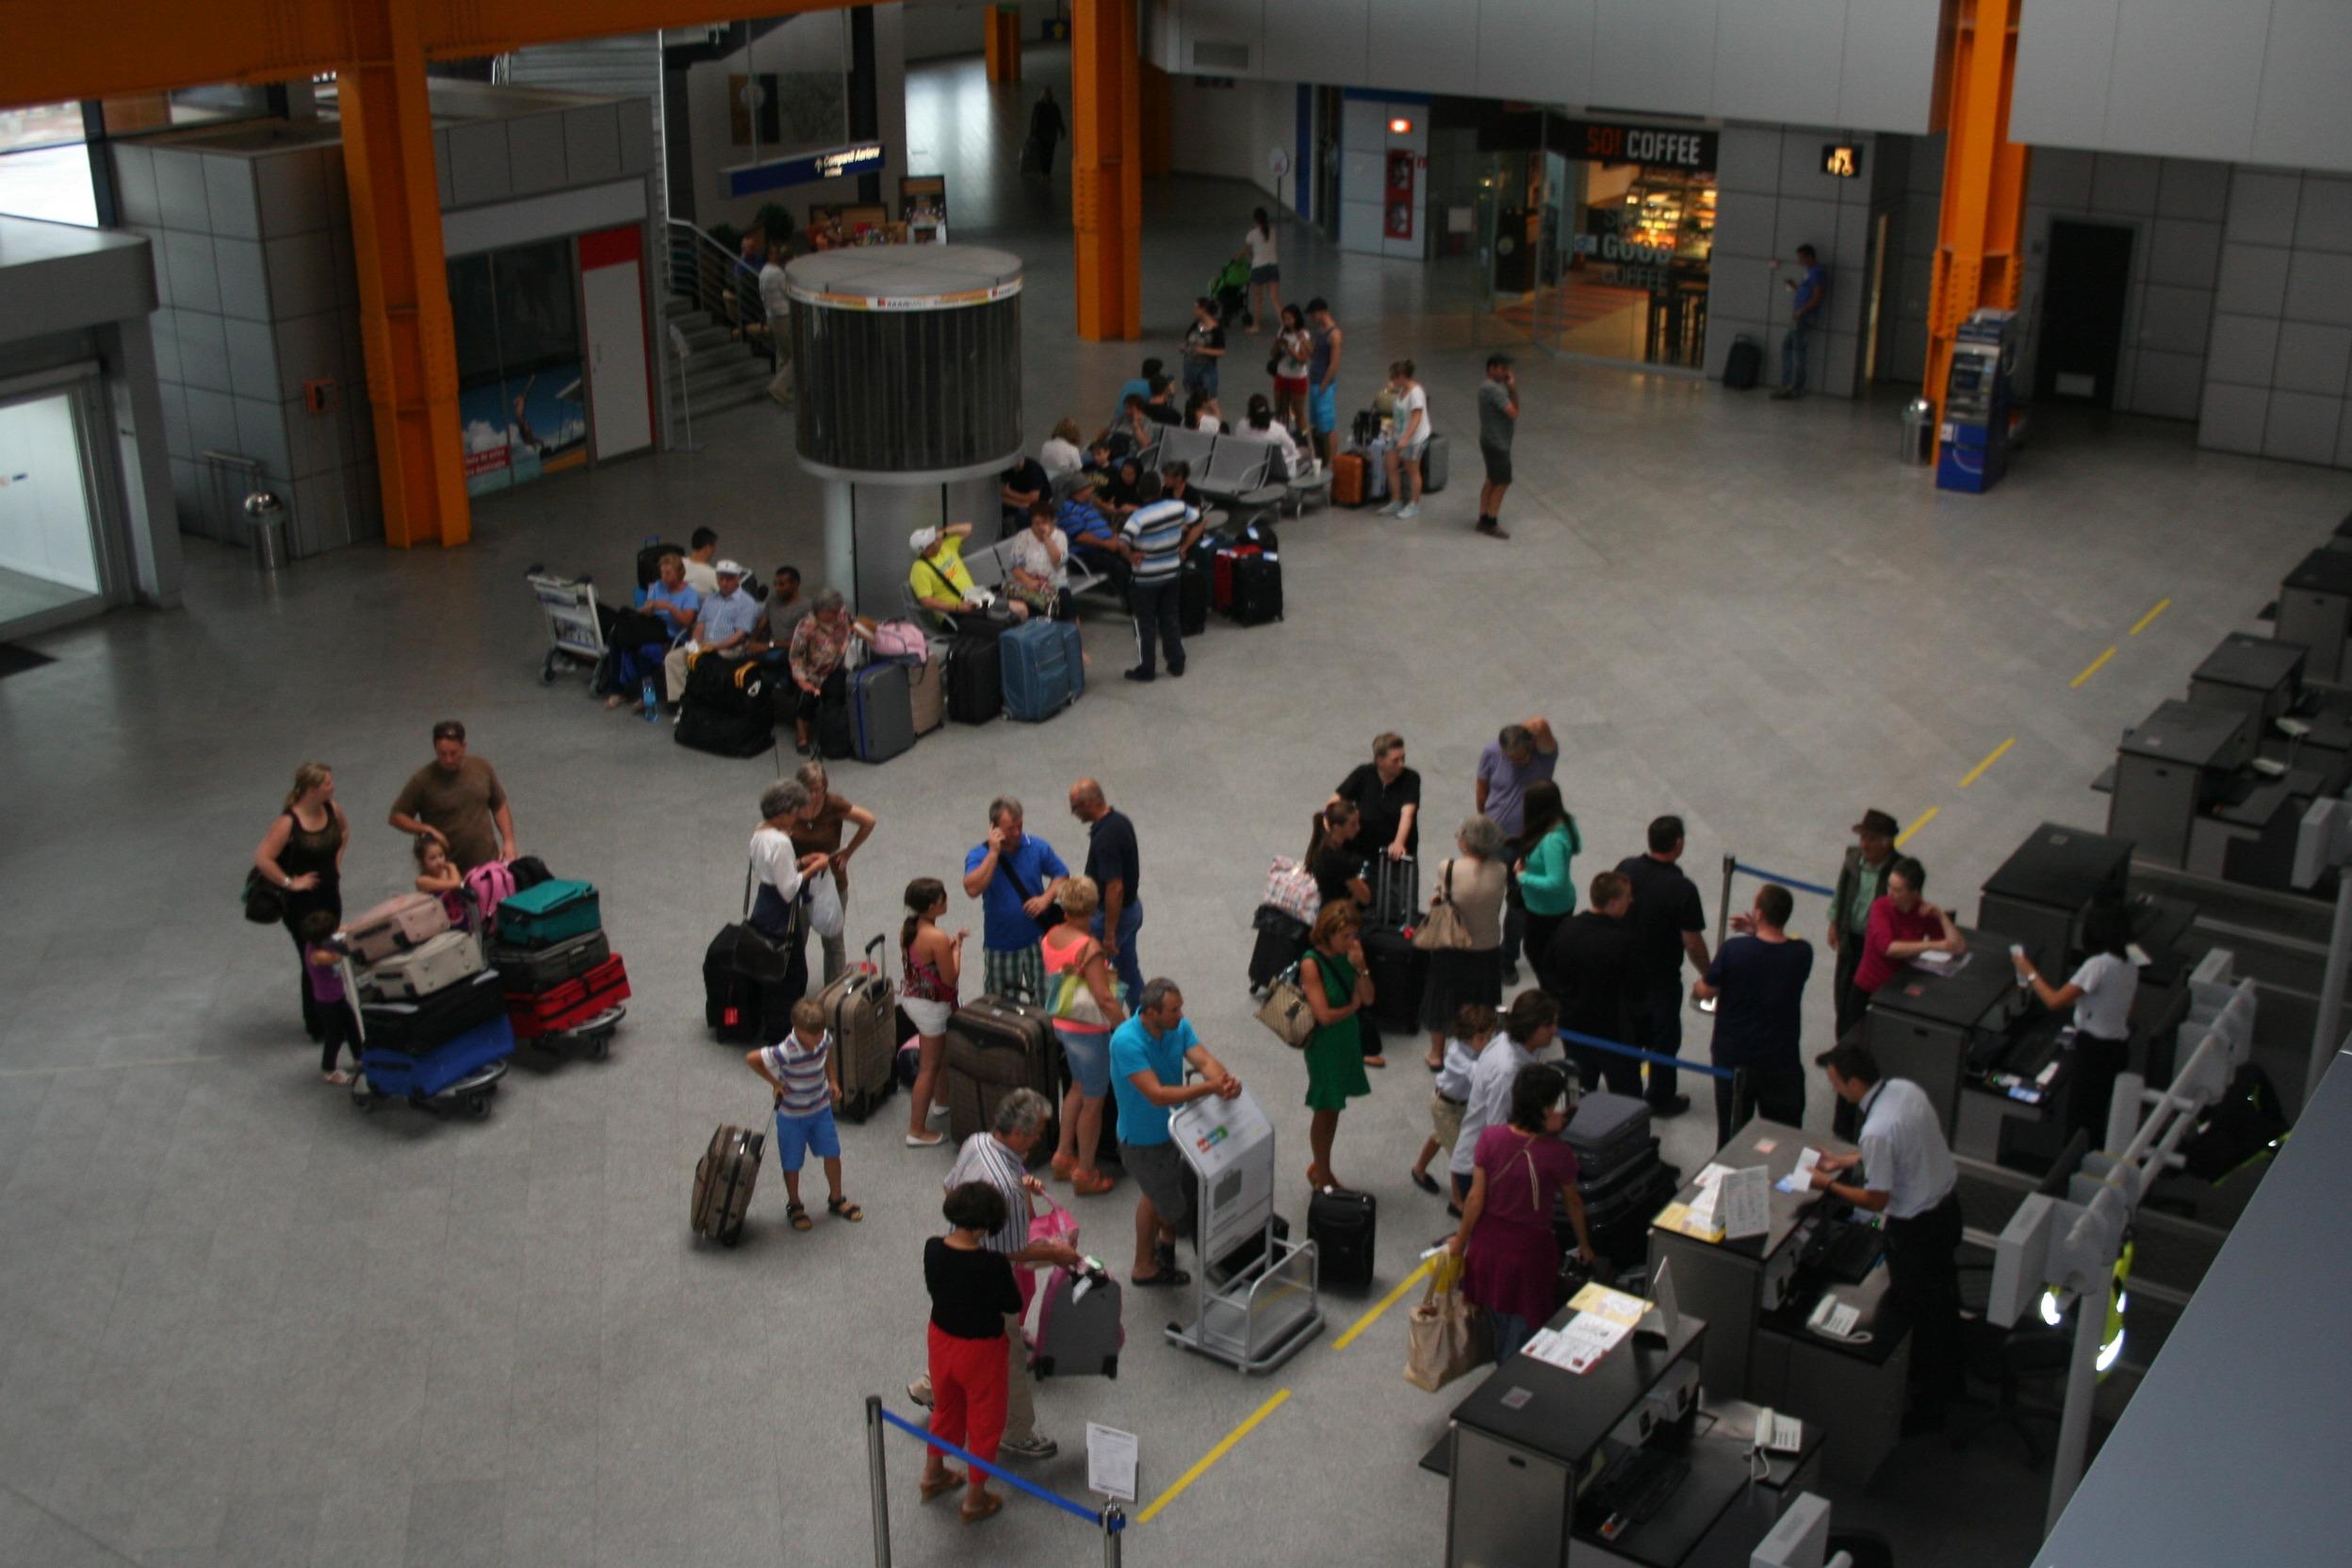 Aeroport Avram Iancu din Cluj Napoca (airportcluj.ro)